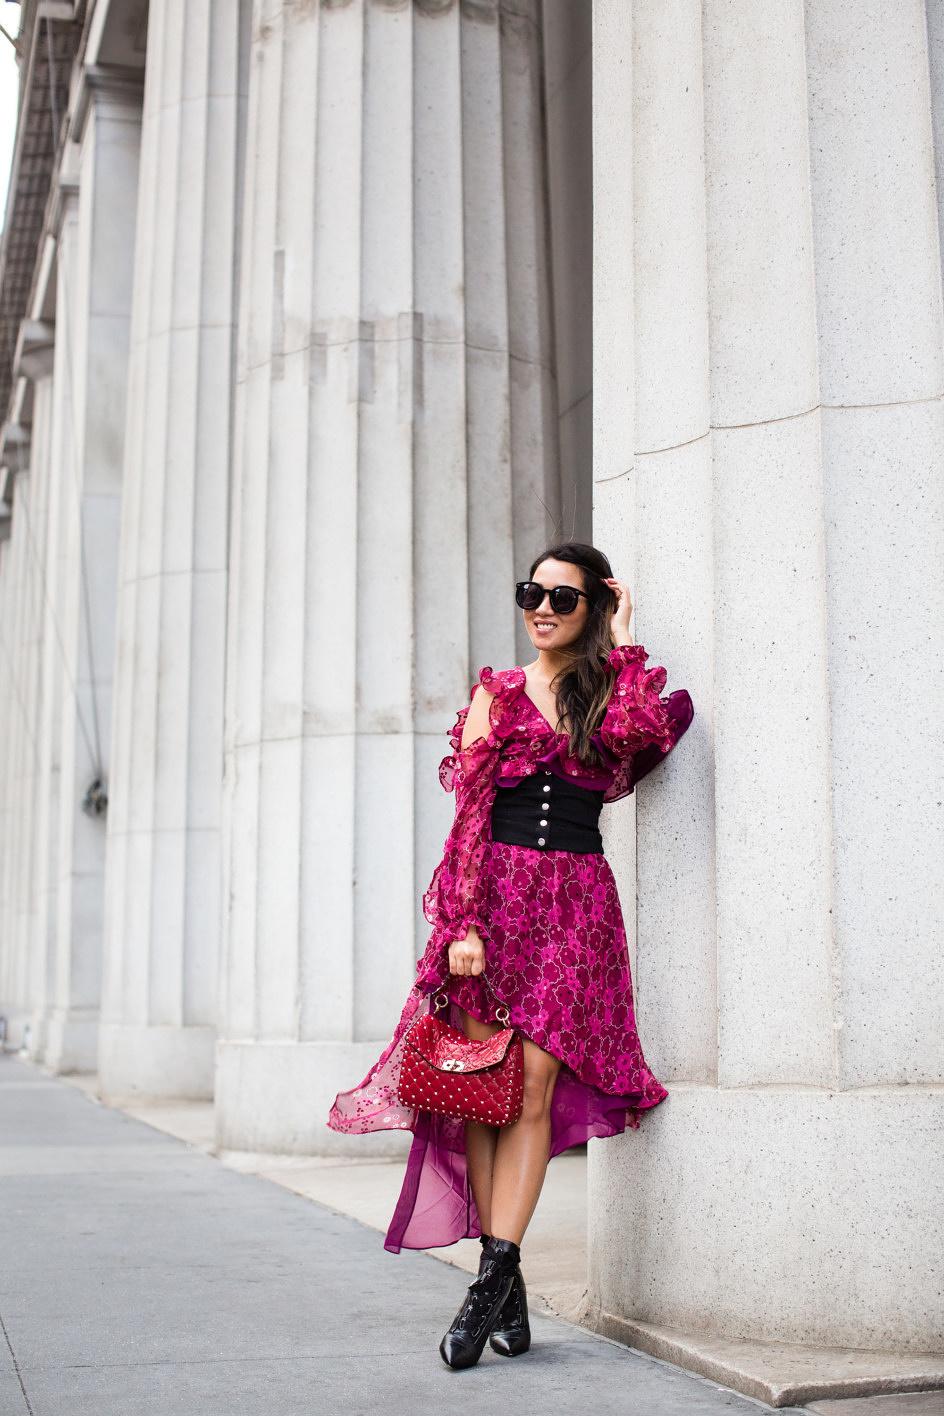 Keep your teen fashion blog